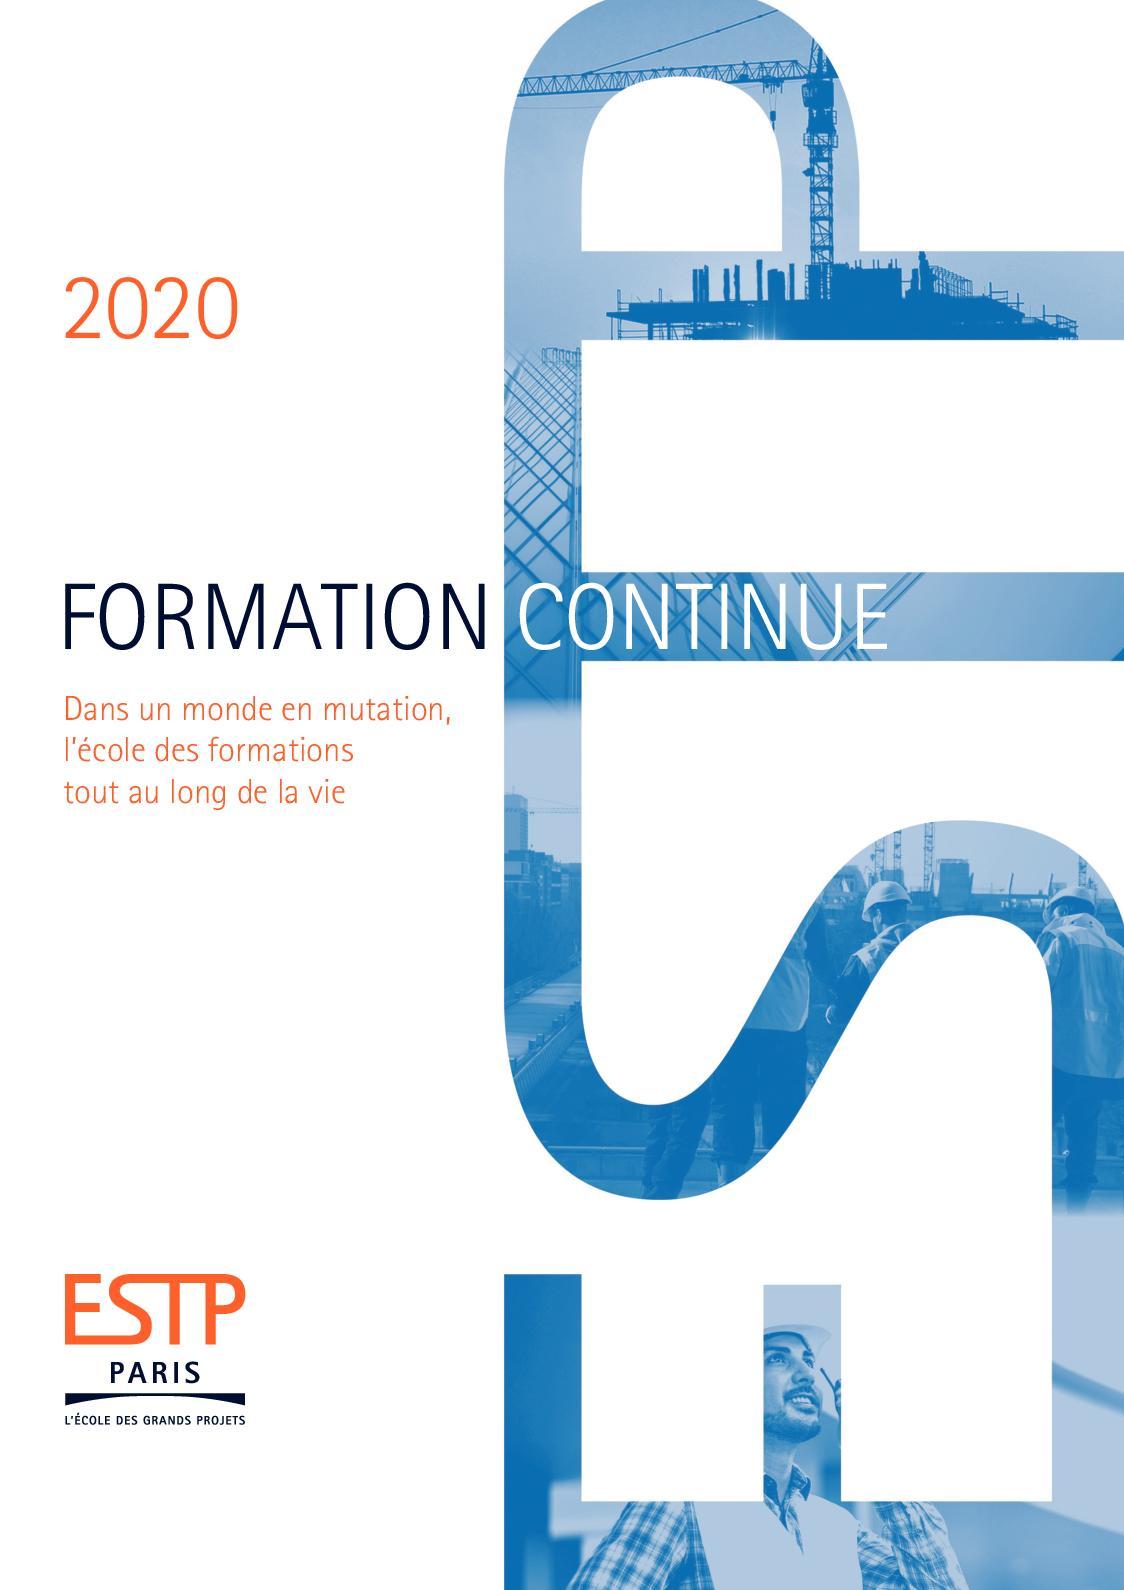 Calaméo Estp Pariscatalogue 2020